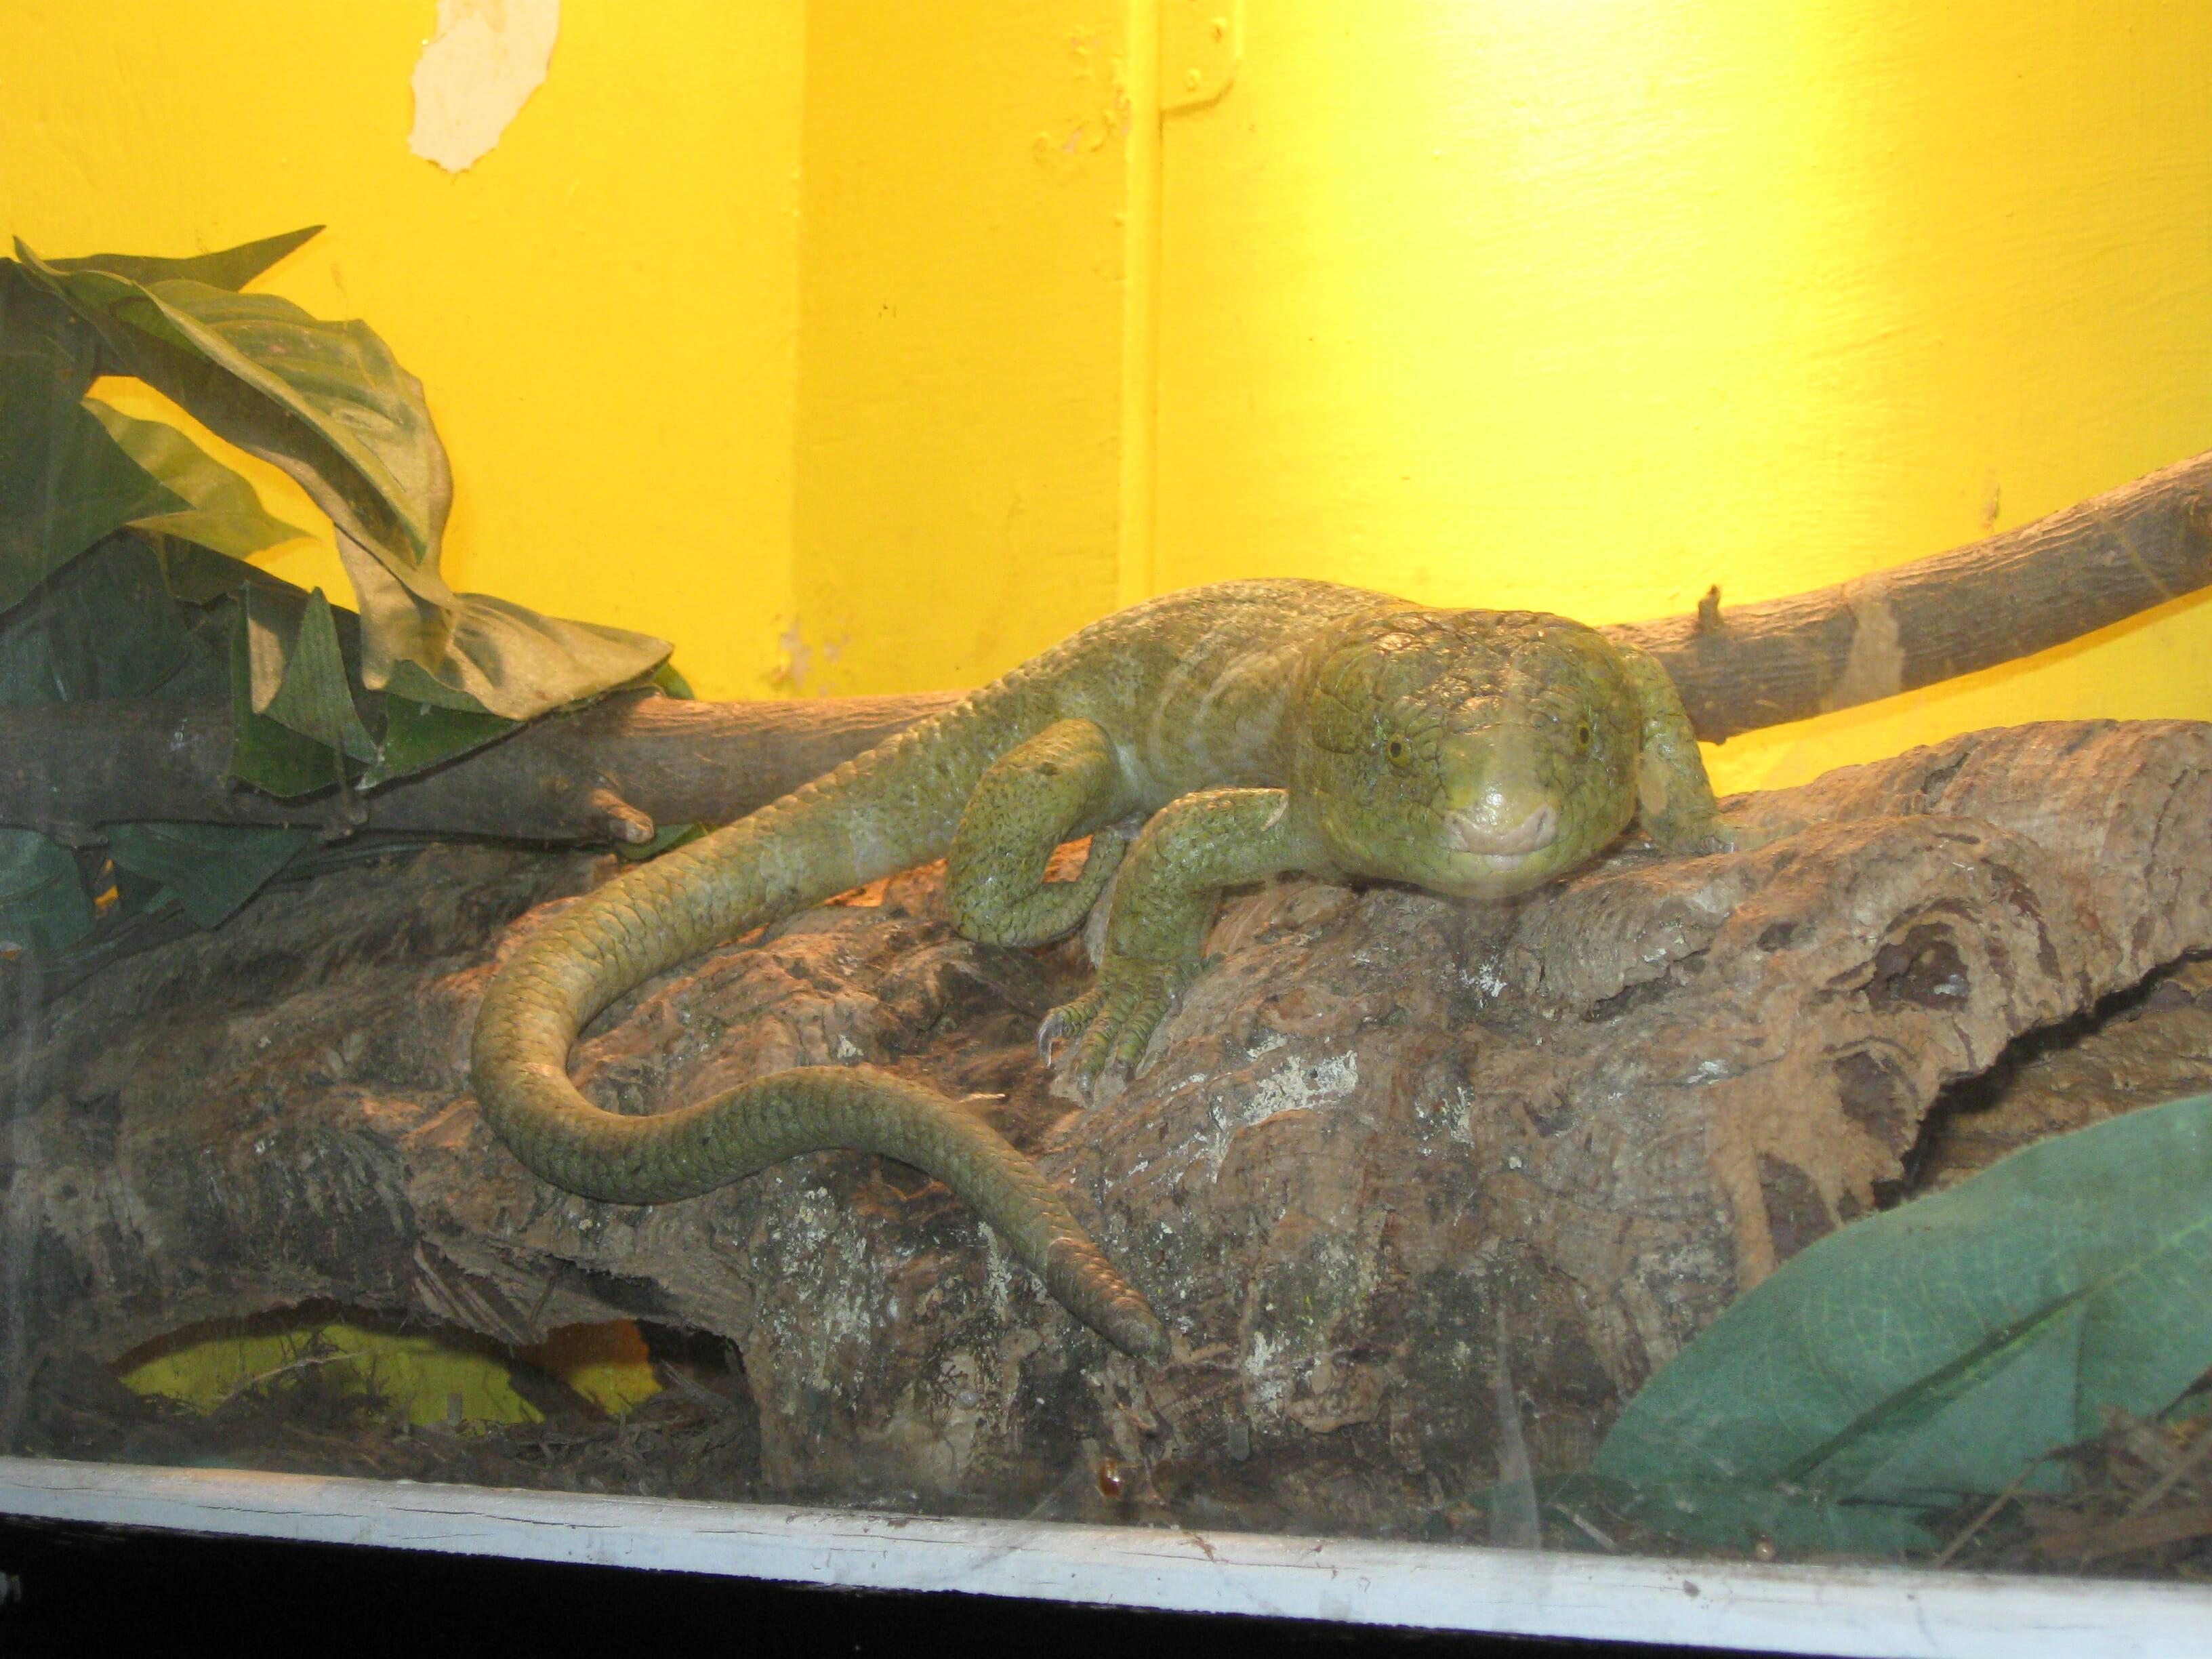 Prehensile-tailed skink